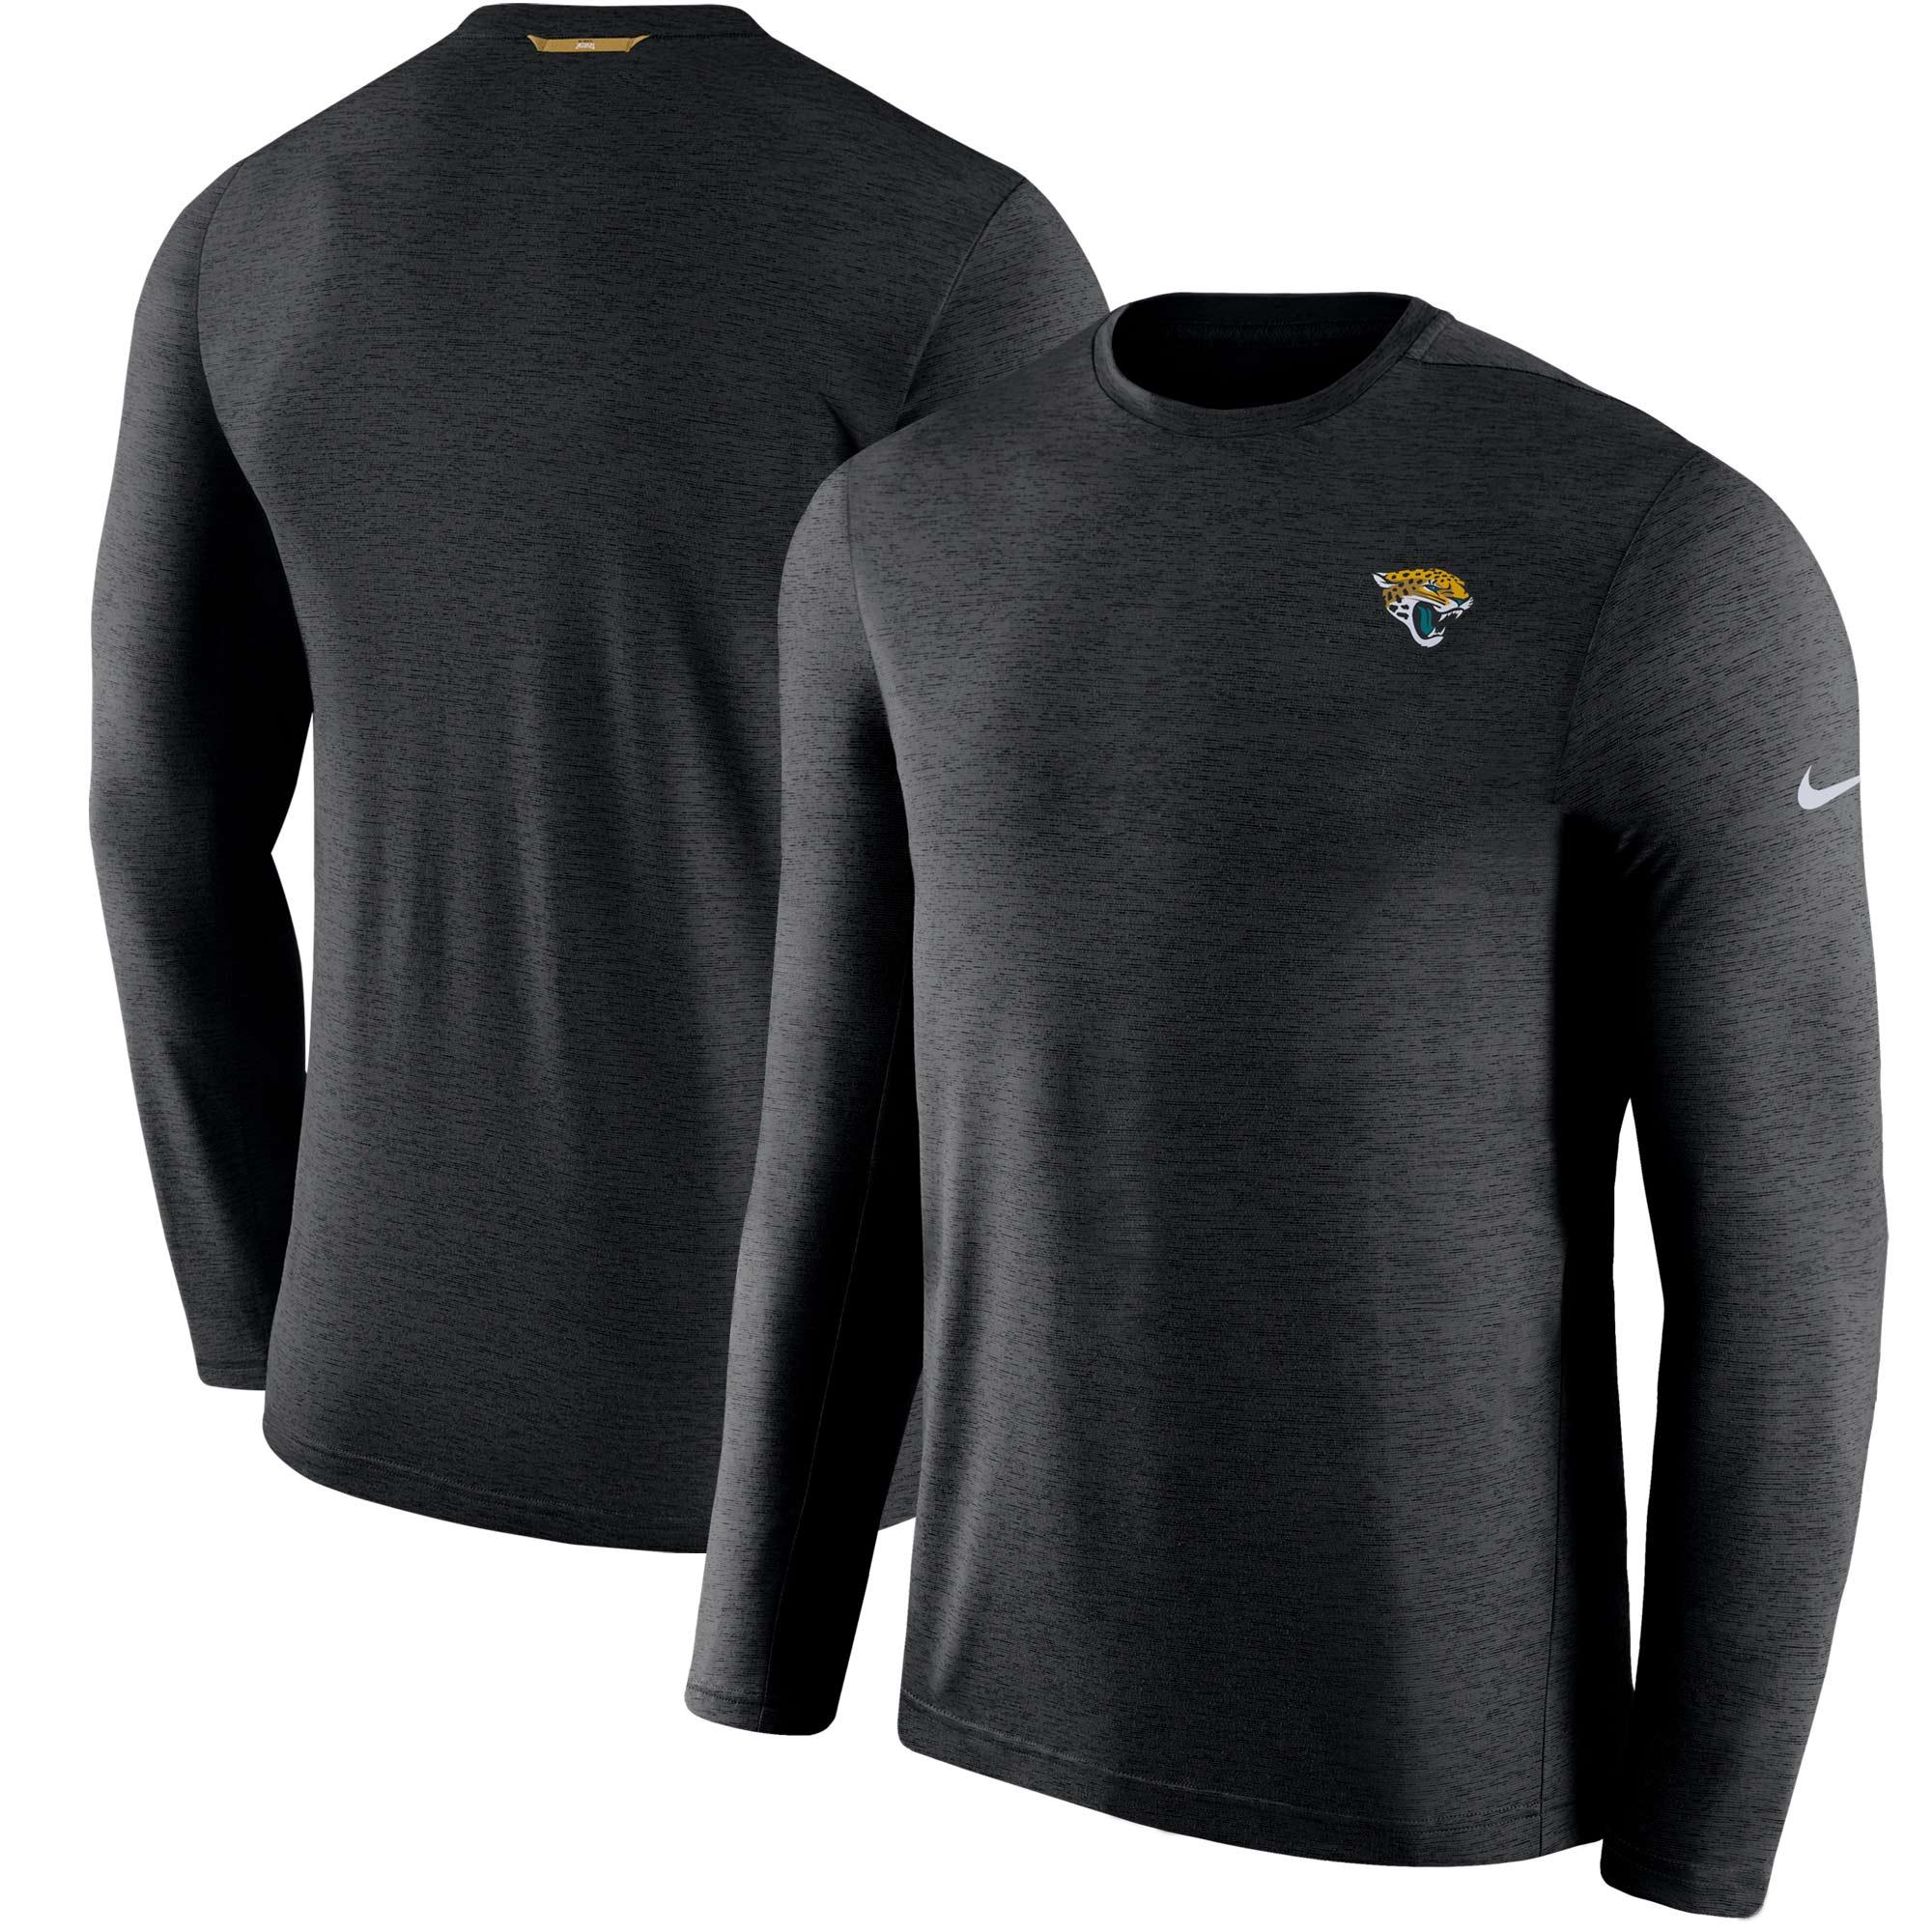 Jacksonville Jaguars Nike Sideline Coaches Primary Logo Long Sleeve Performance T-Shirt - Black